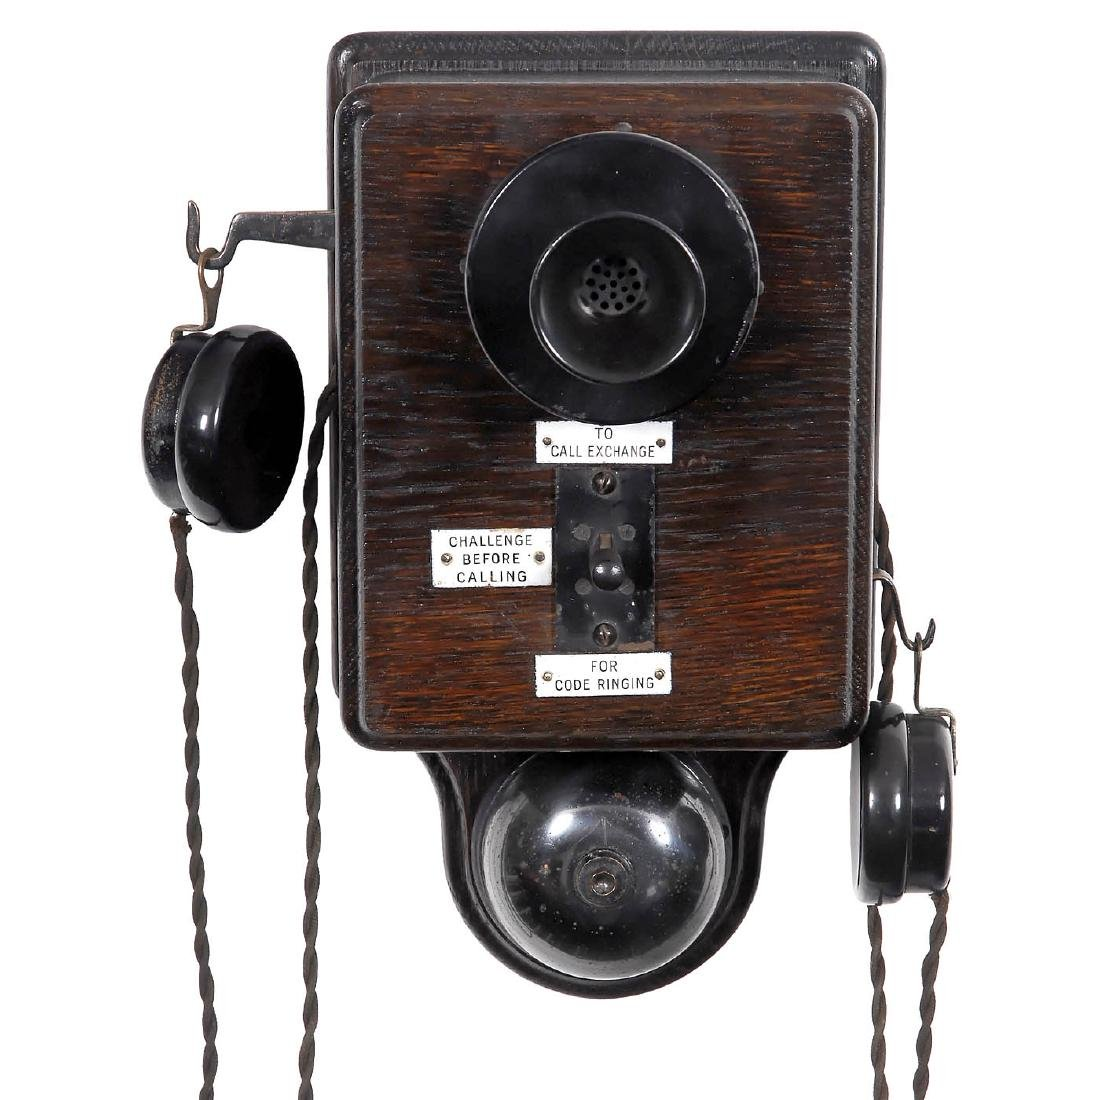 Ericsson Wall Telephone, c. 1920